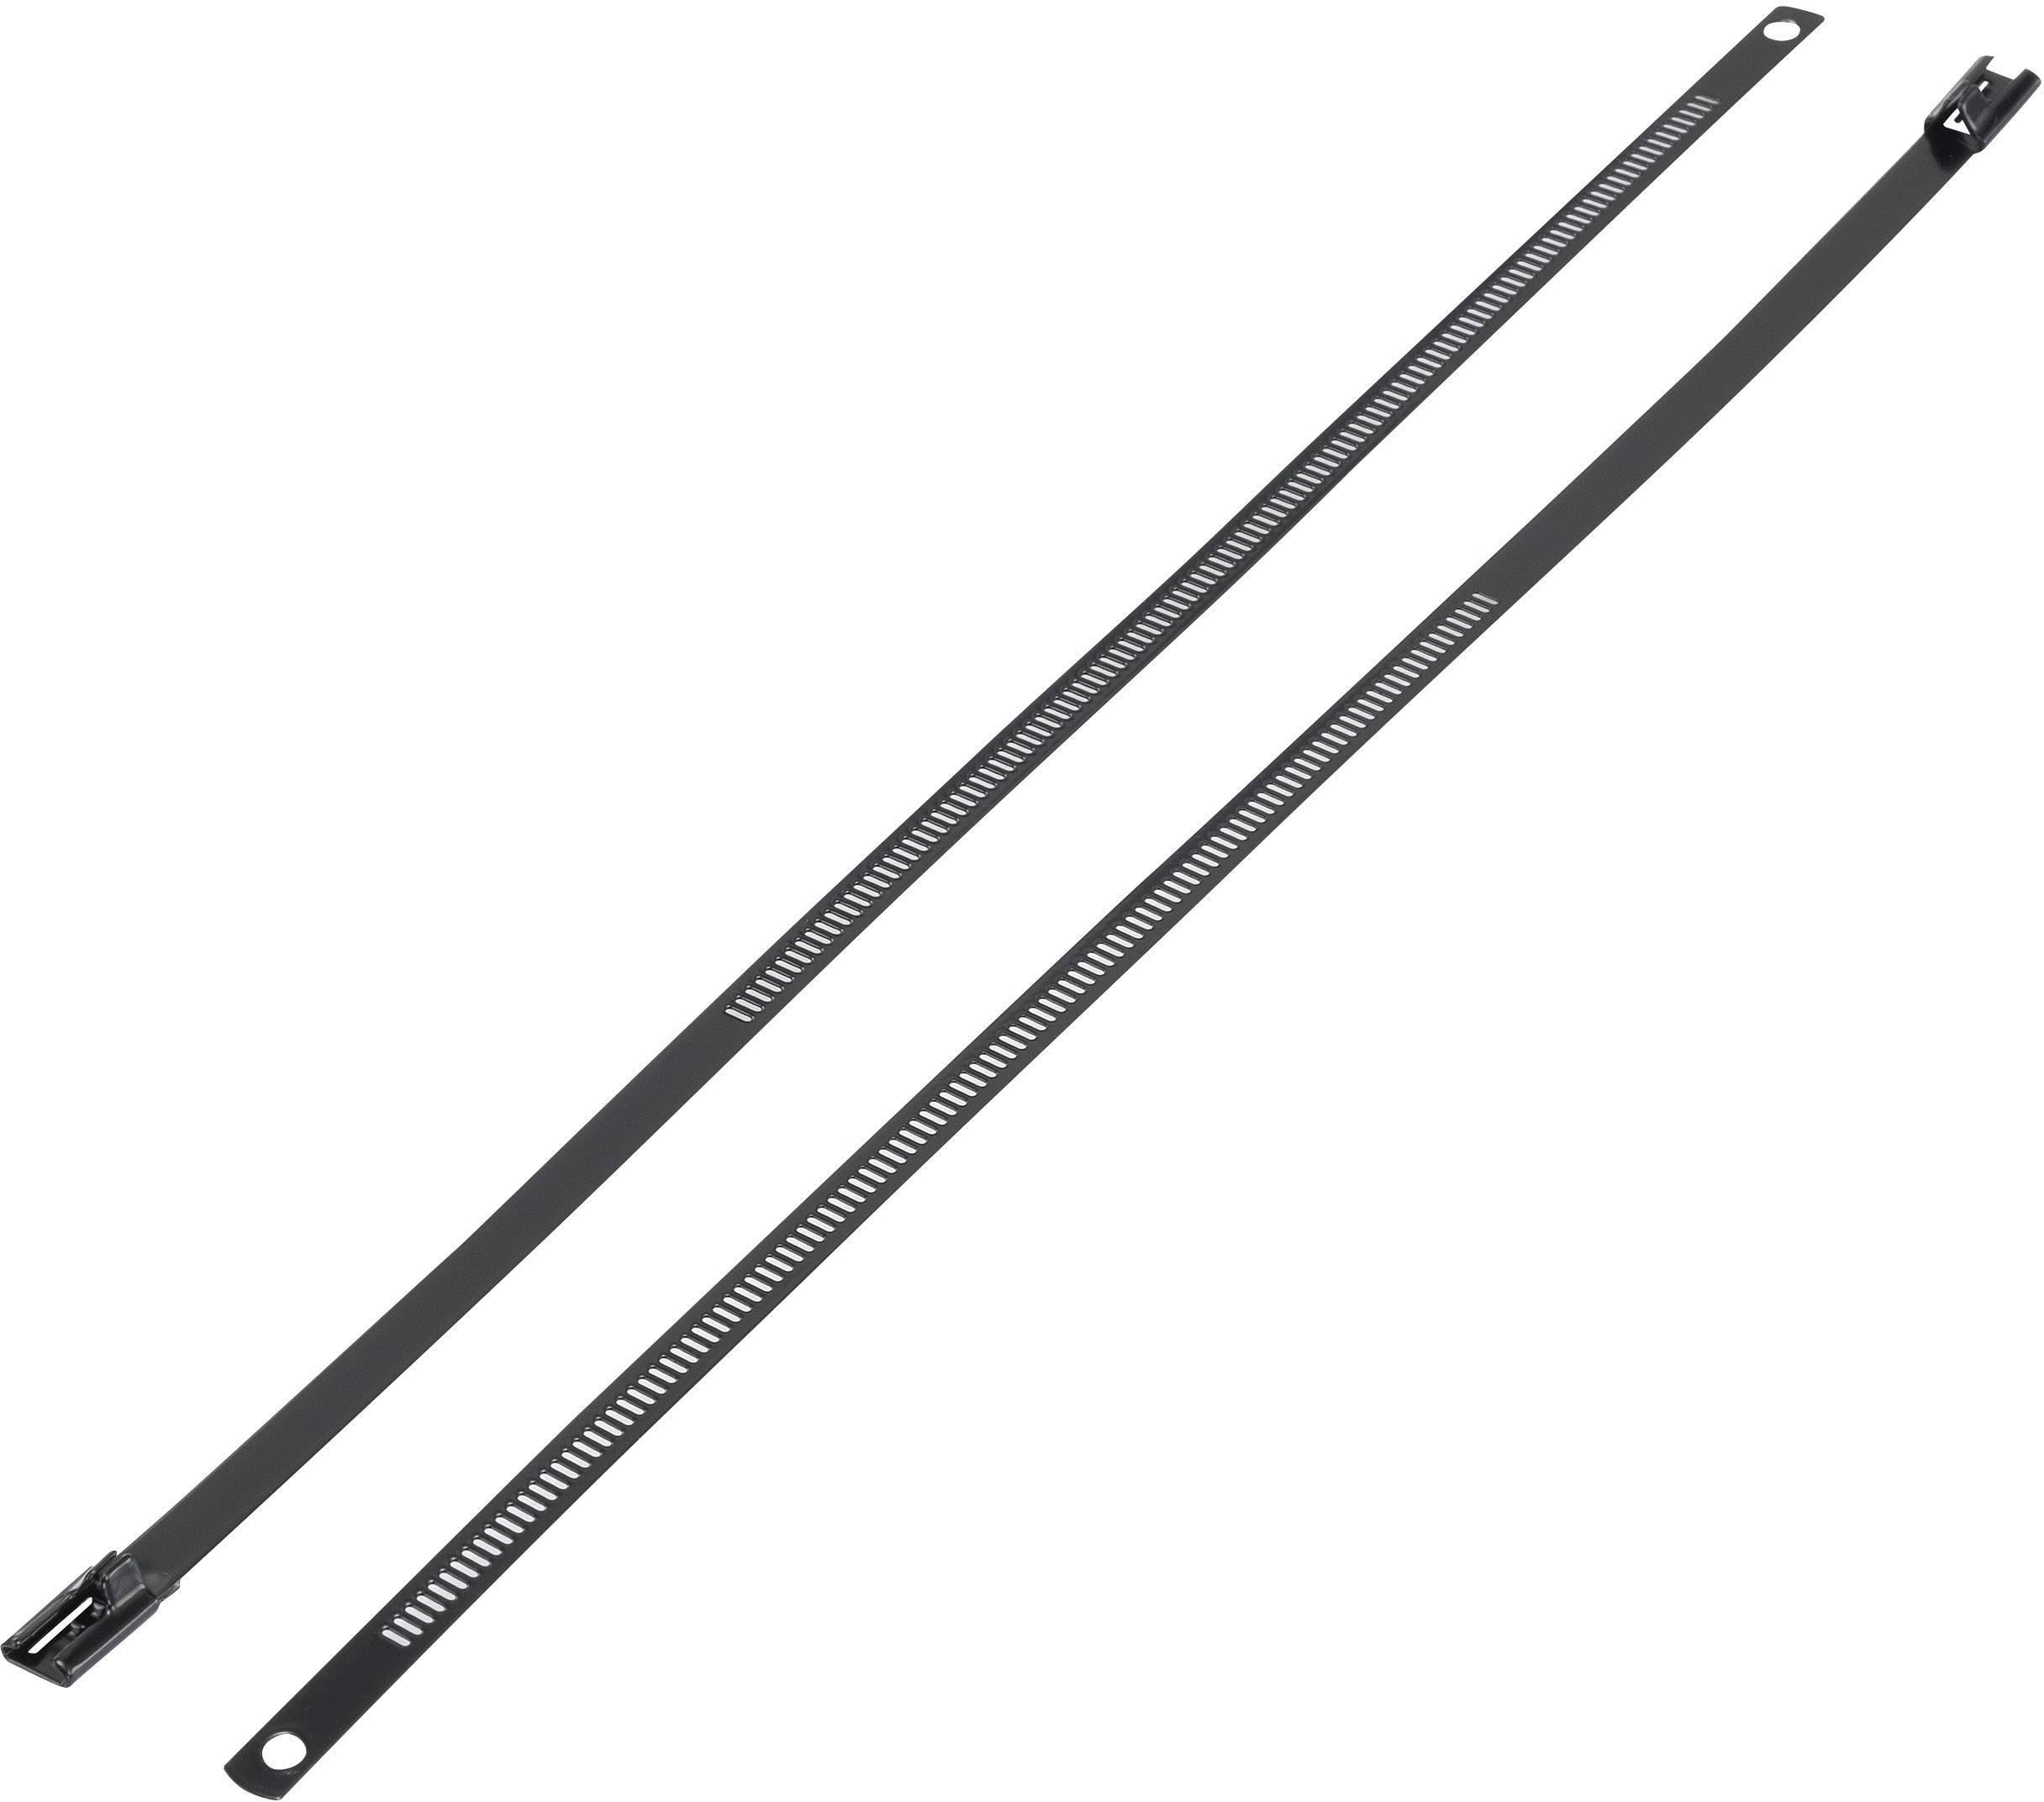 Stahovací pásek ocelový KSS, 300 mm x 7 mm ASTN-300